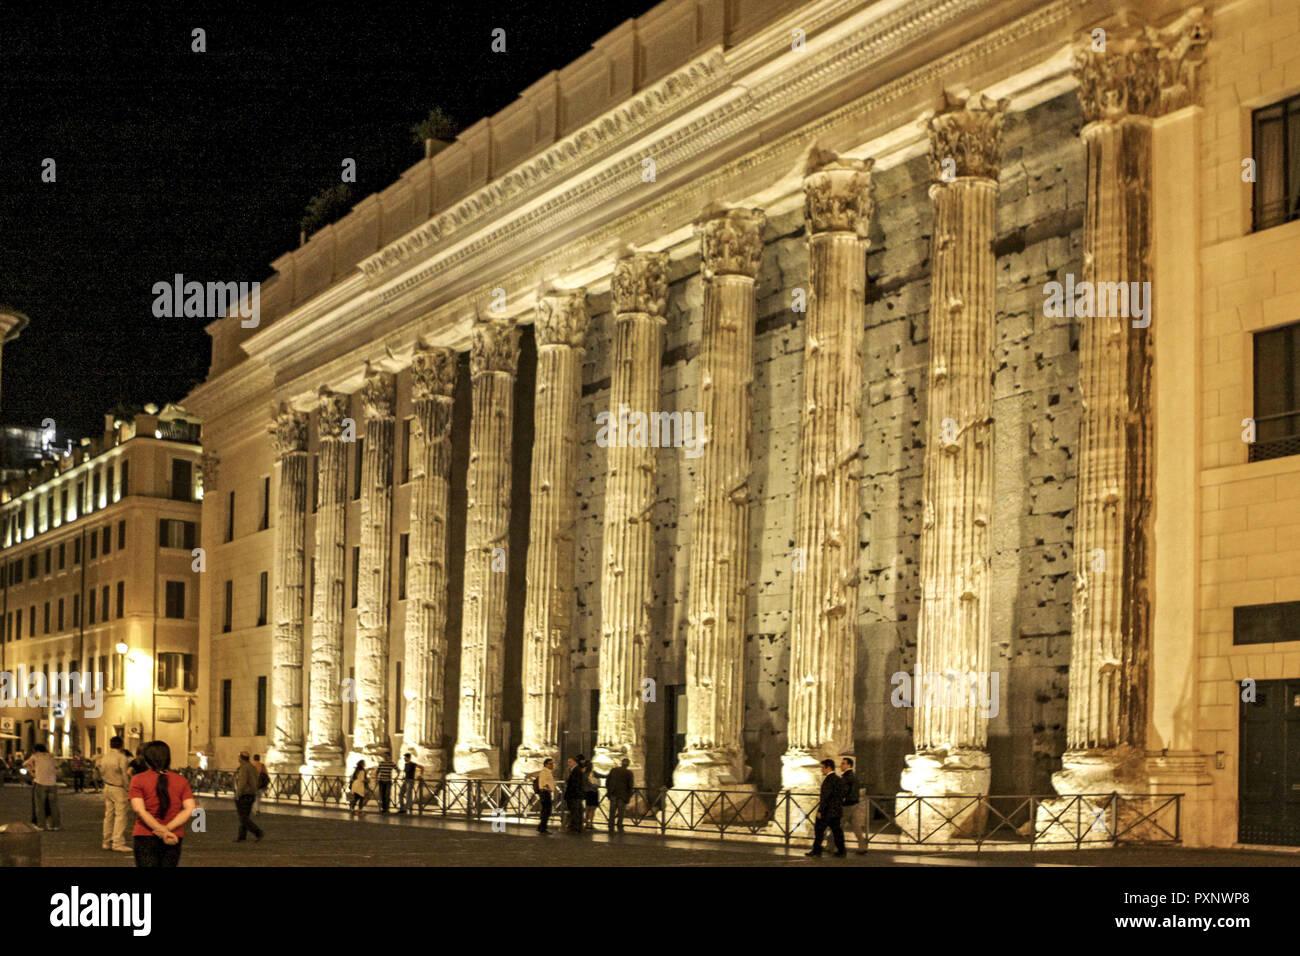 Italy, Rom, Piazza di Pietra und Hadrianstempel bei Nacht - Stock Image